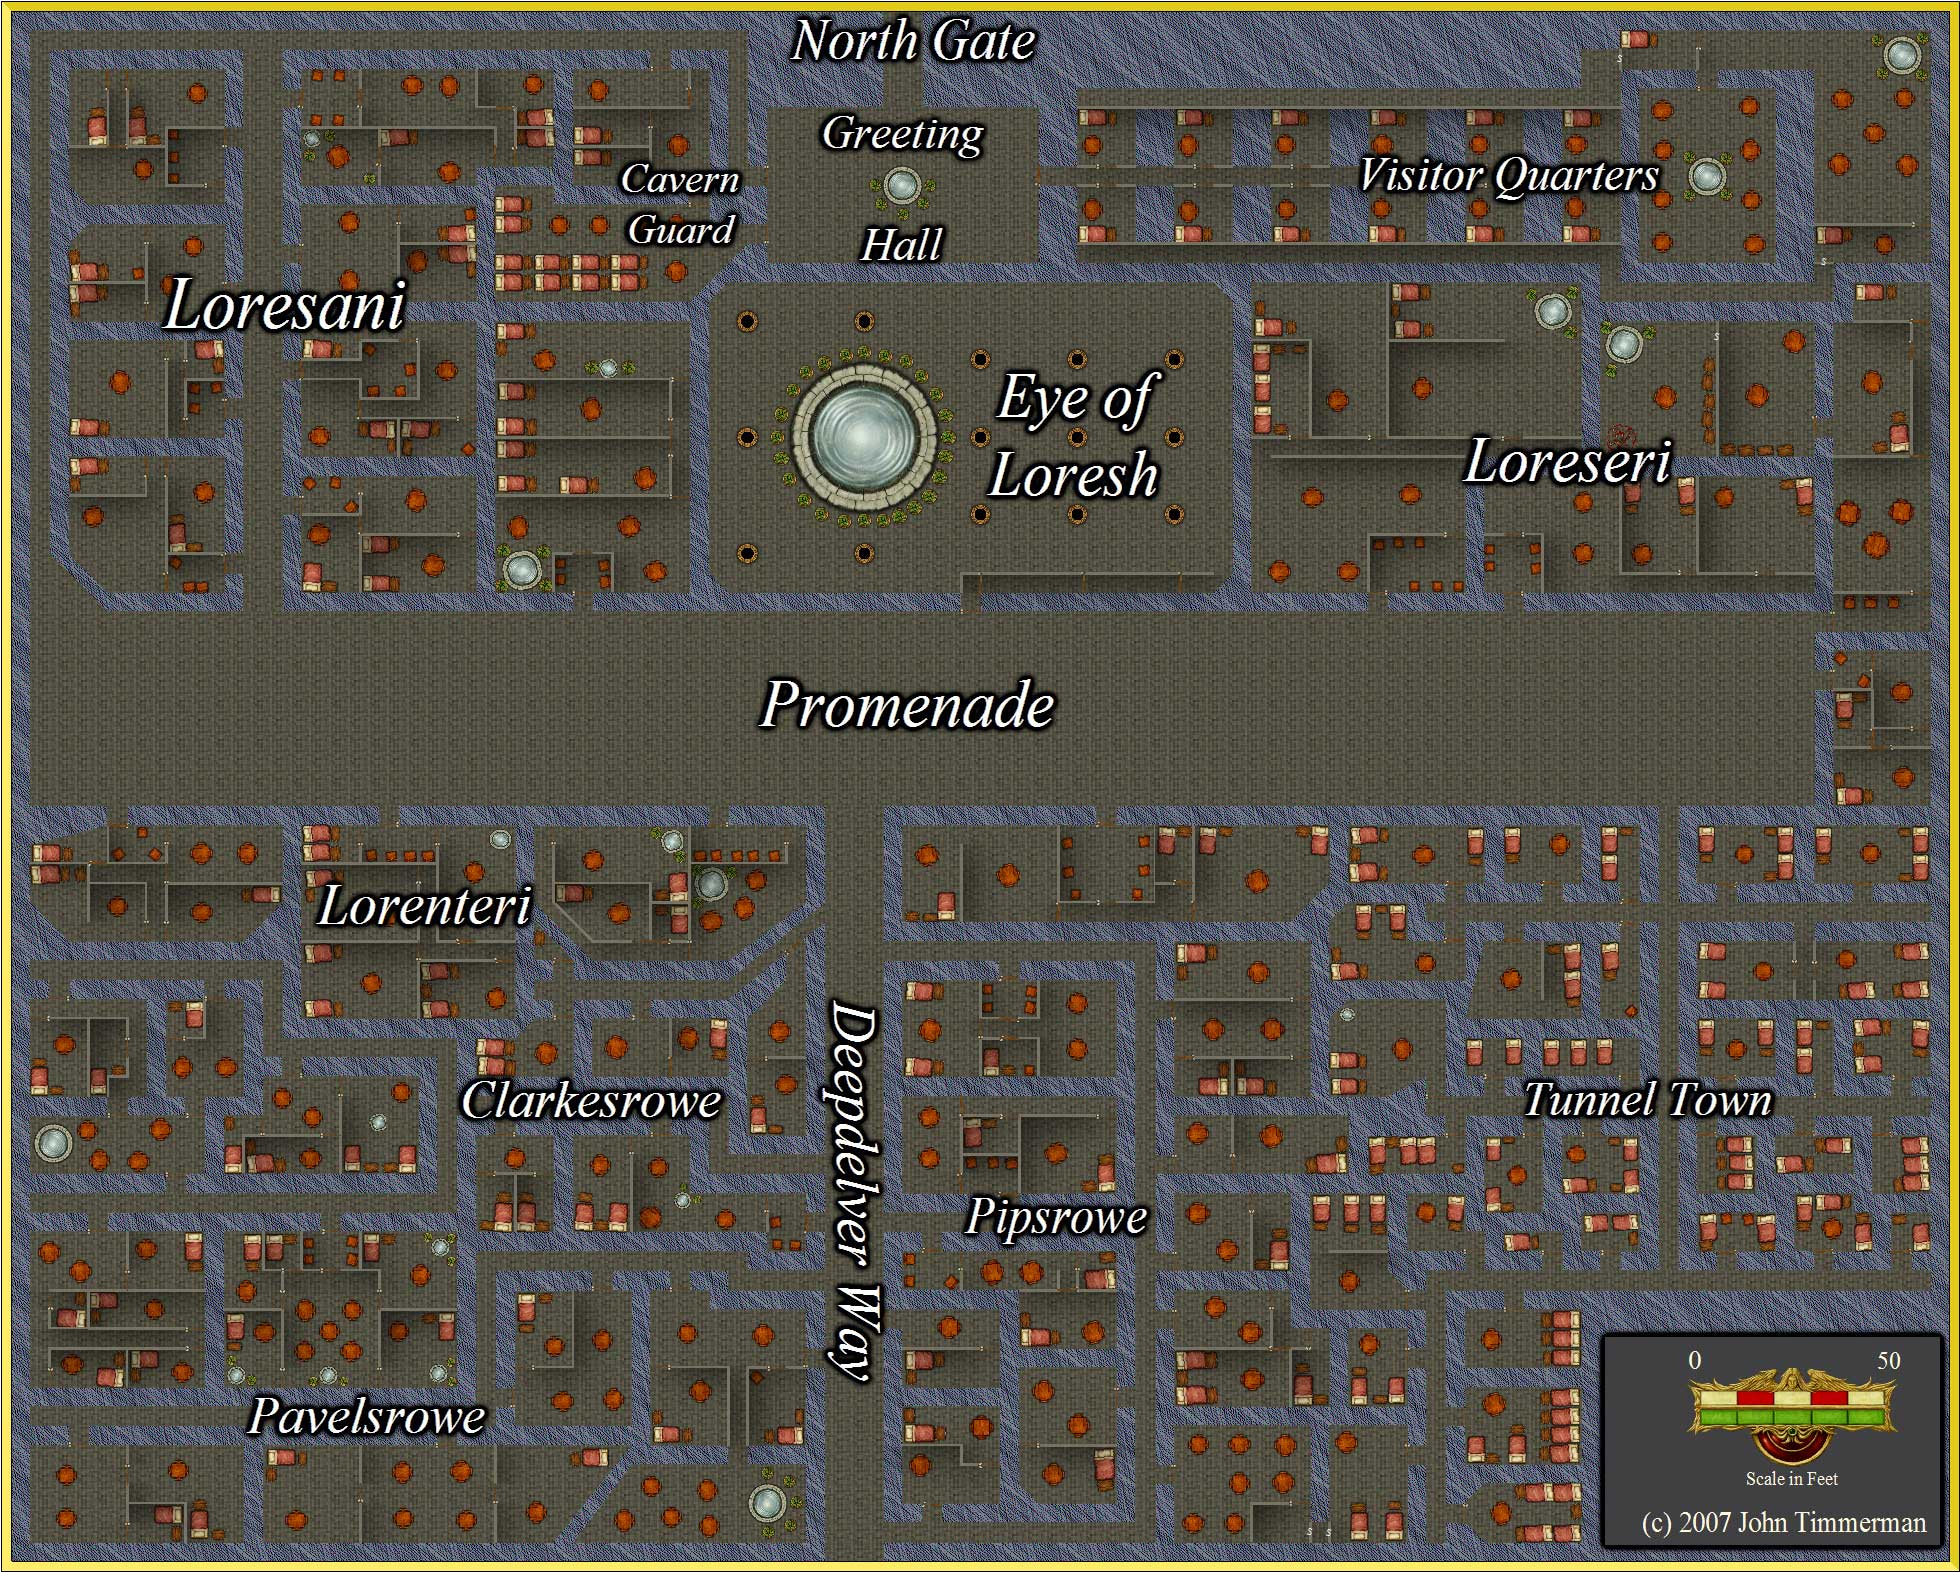 Fantasy Dungeon Map #3 - Free Fantasy Maps on european map maker, cute map maker, country map maker, desert map maker, battletech map maker, party map maker, dnd map maker, dutch map maker, village map maker, office map maker, overworld map maker, rpg map maker, baseball map maker, town map maker, cartoon map maker, d d maps maker, city map maker, battle map maker,